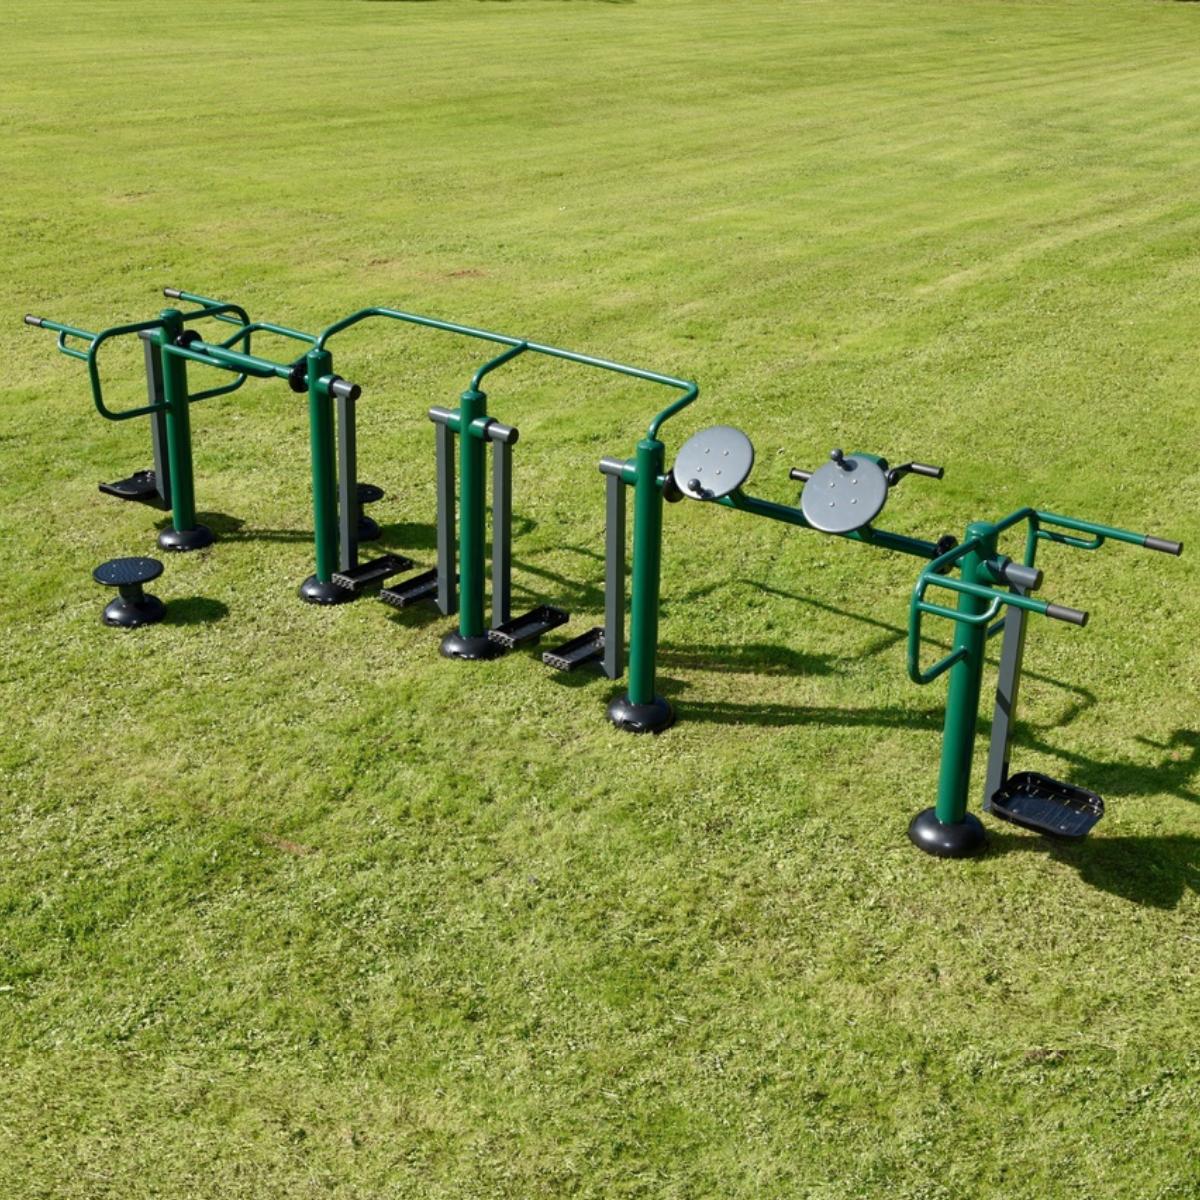 Activ8 Multi Gym   Sunshine Gym   Outdoor Gym Equipment